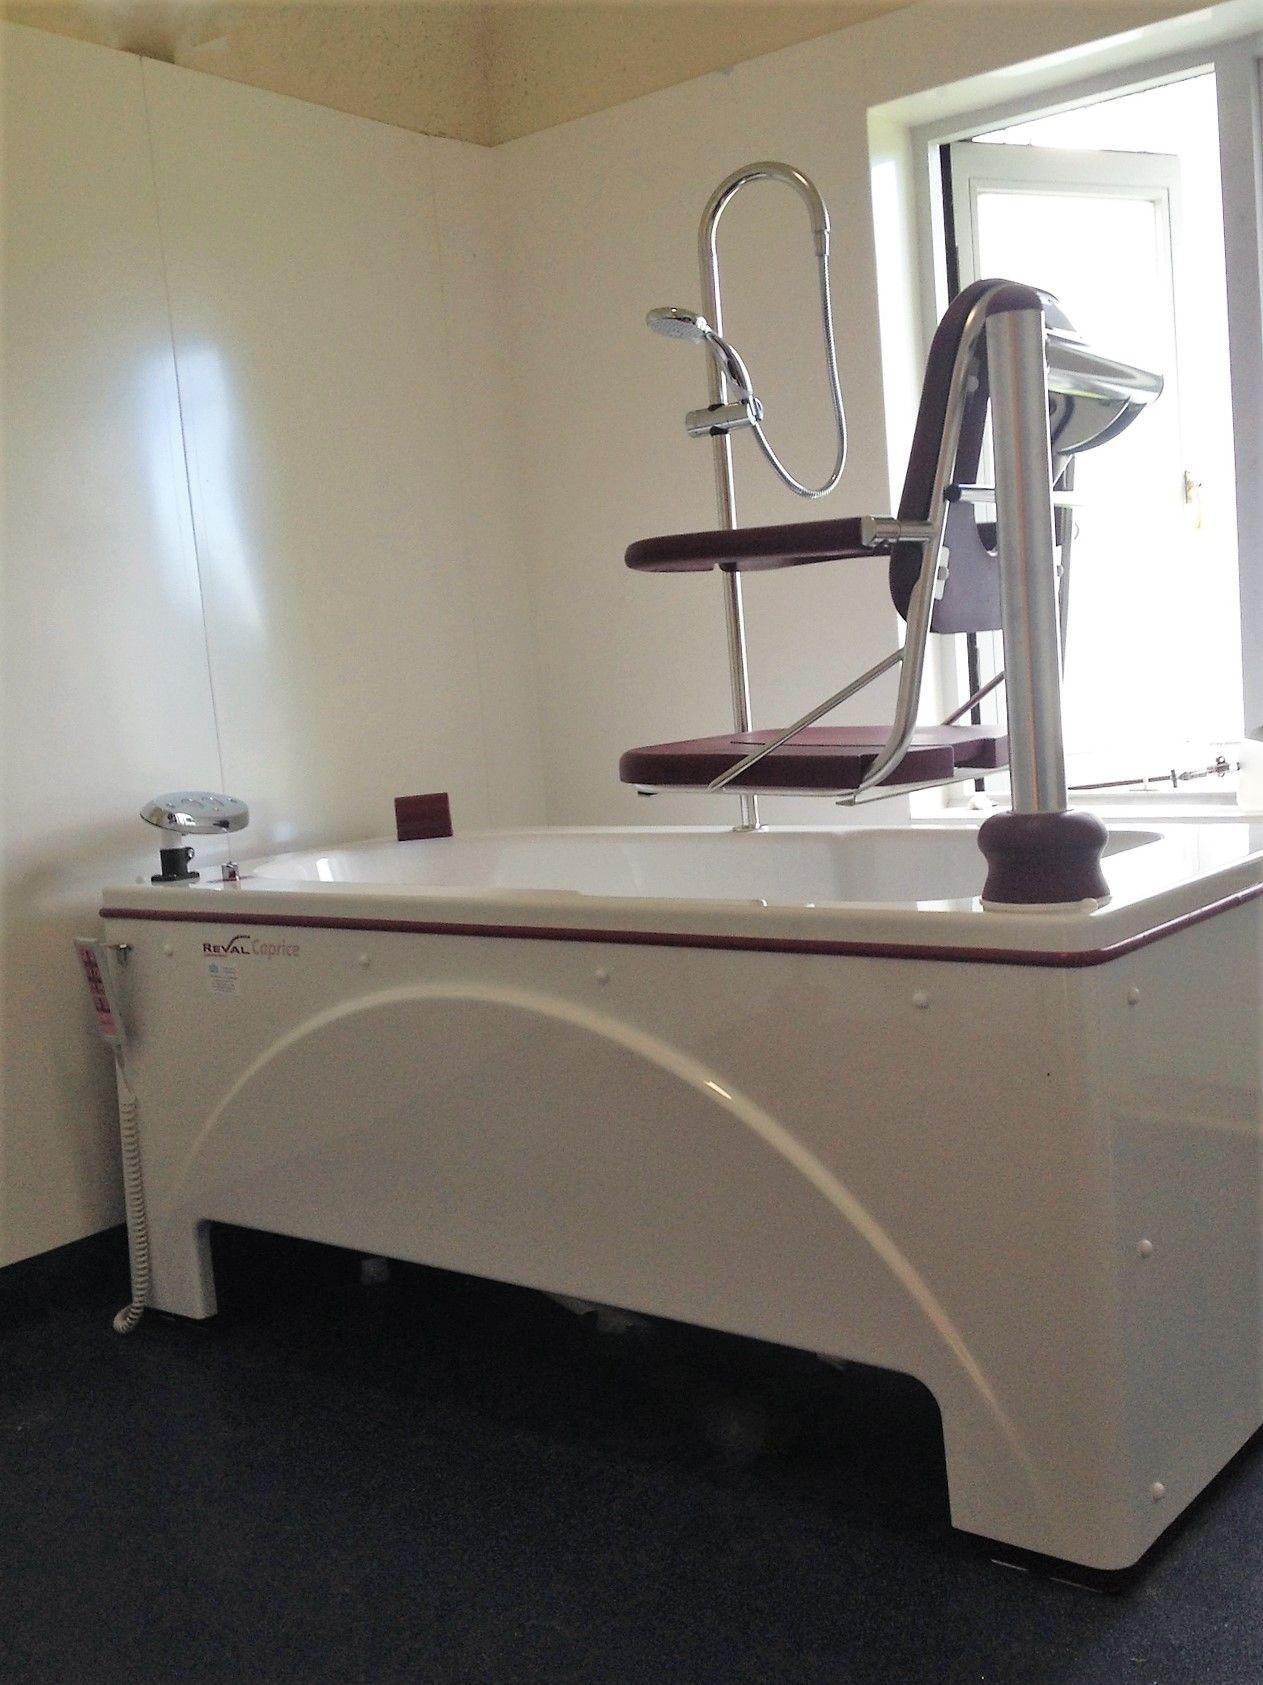 Carprice Hi Low Bath with integrated hoist | Community nursing unit ...